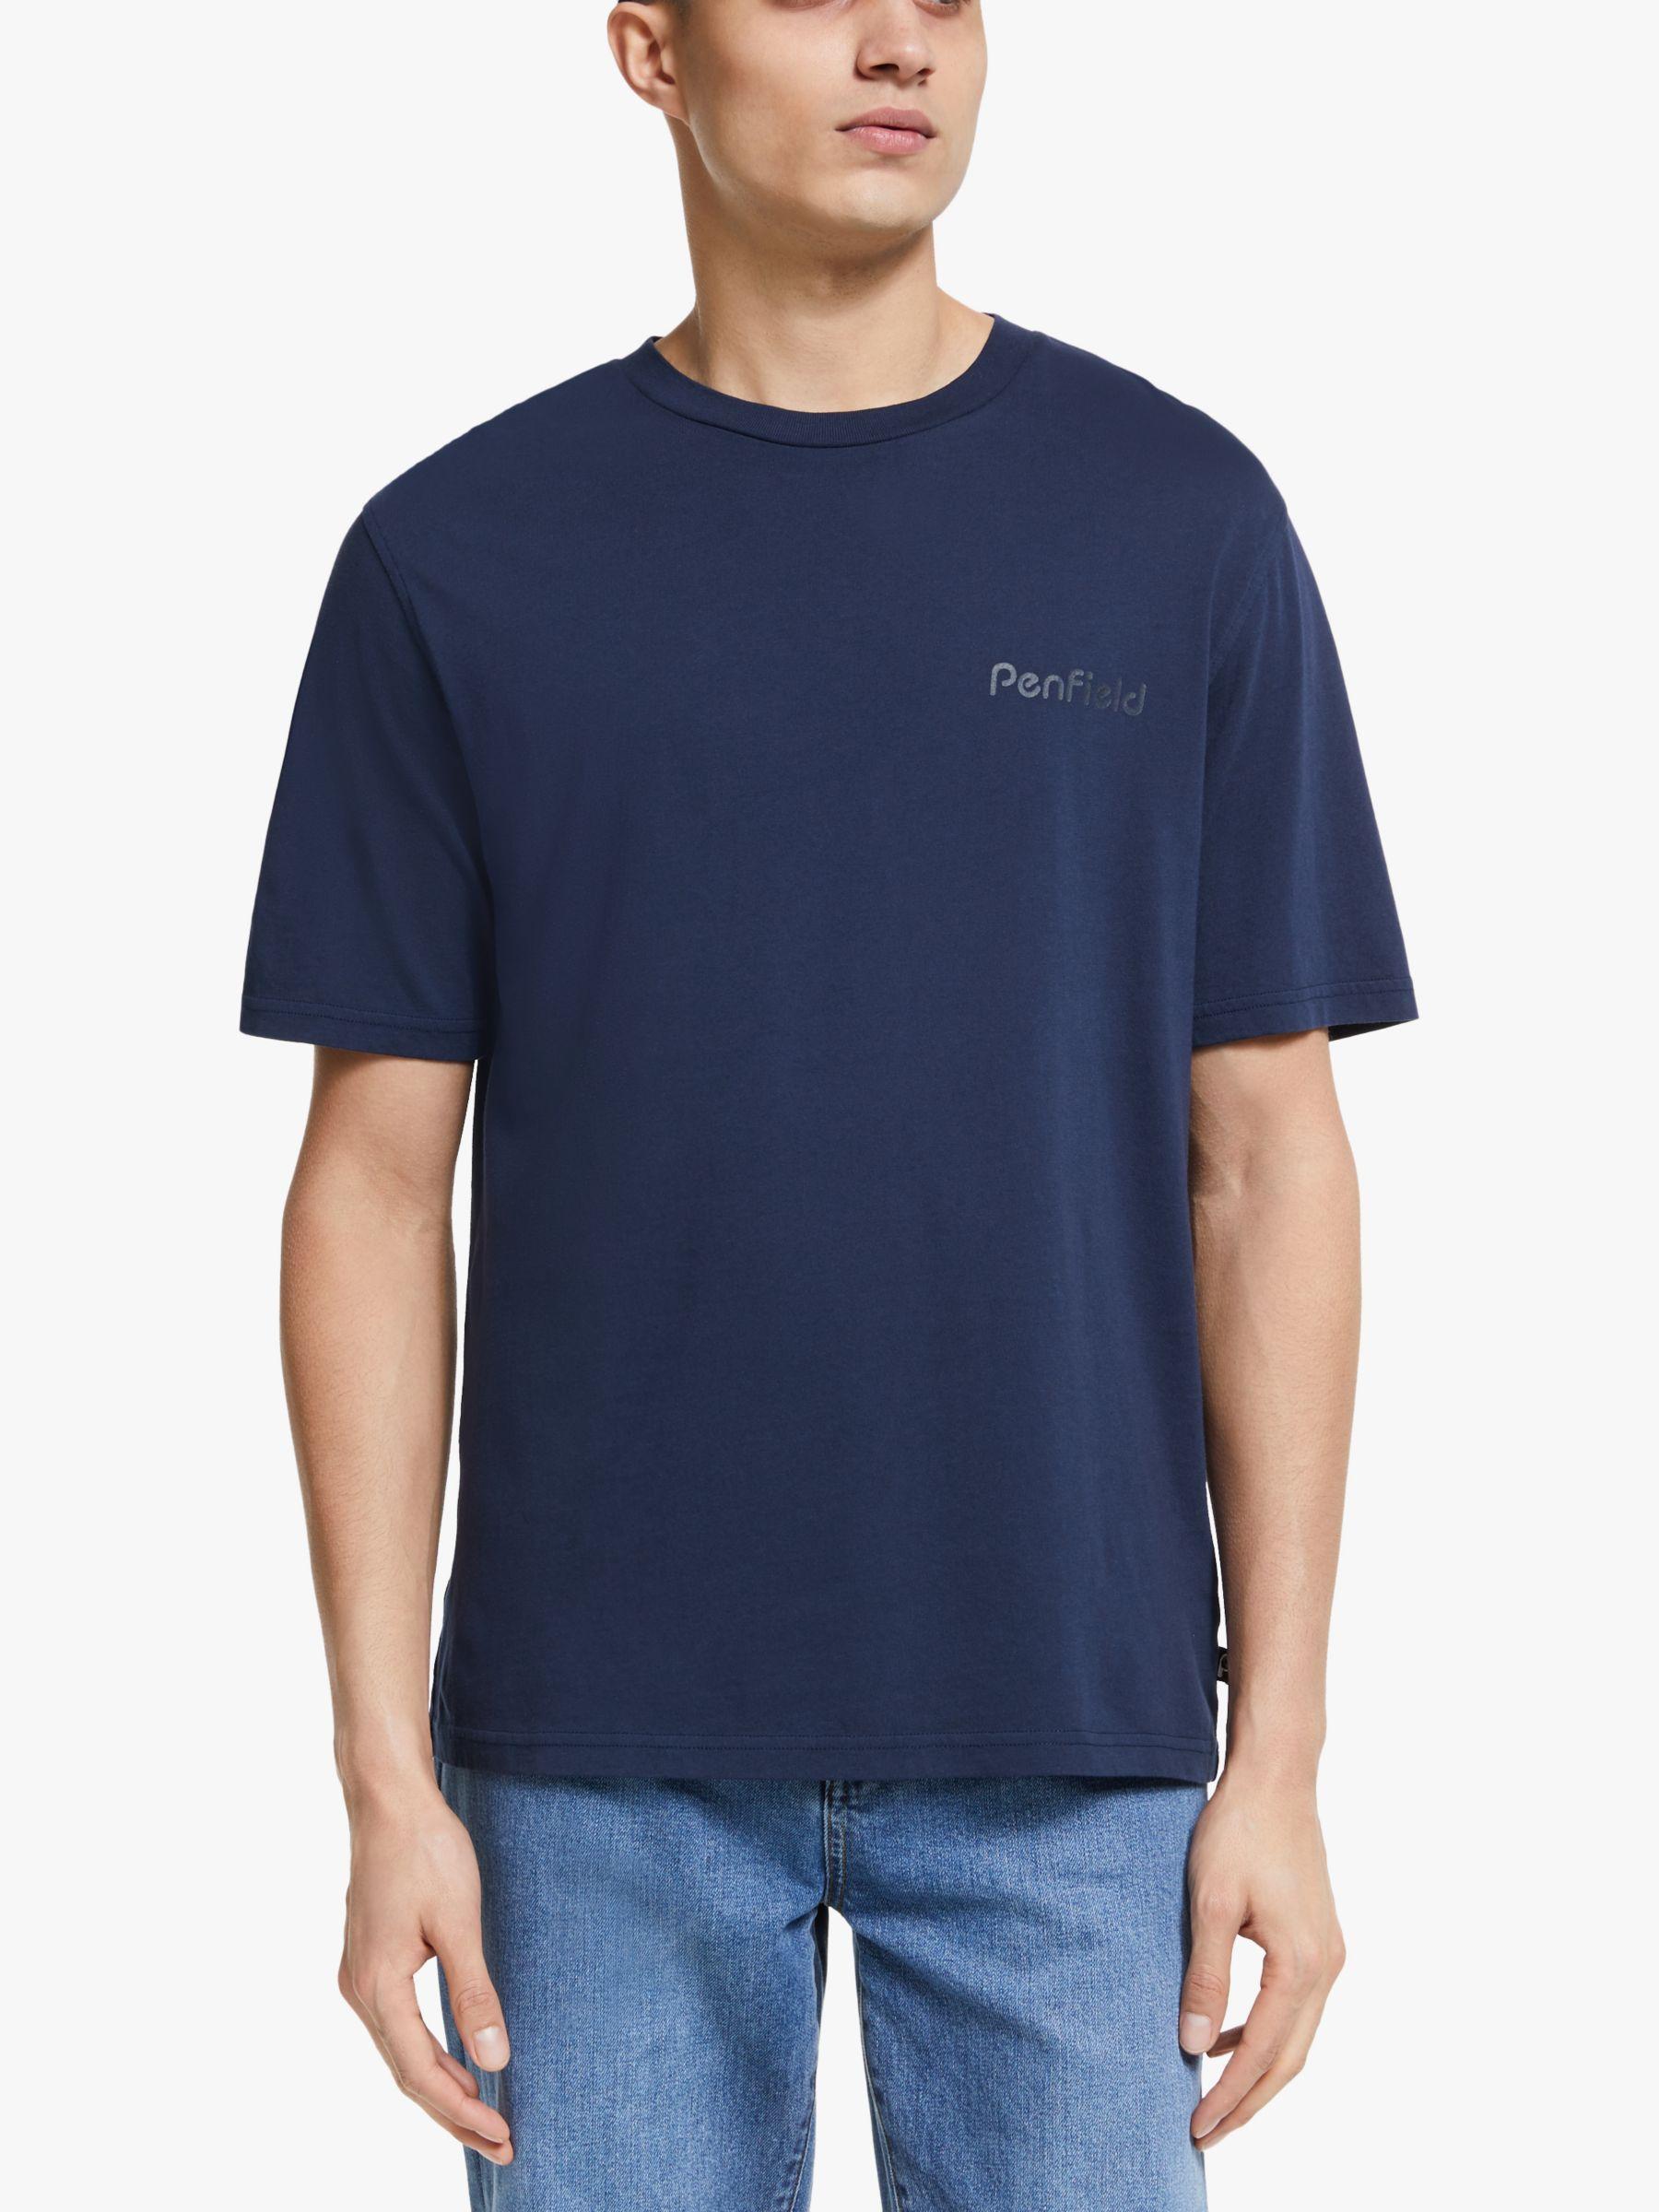 Penfield Penfield Wallpole Logo Organic Cotton T-Shirt, Navy